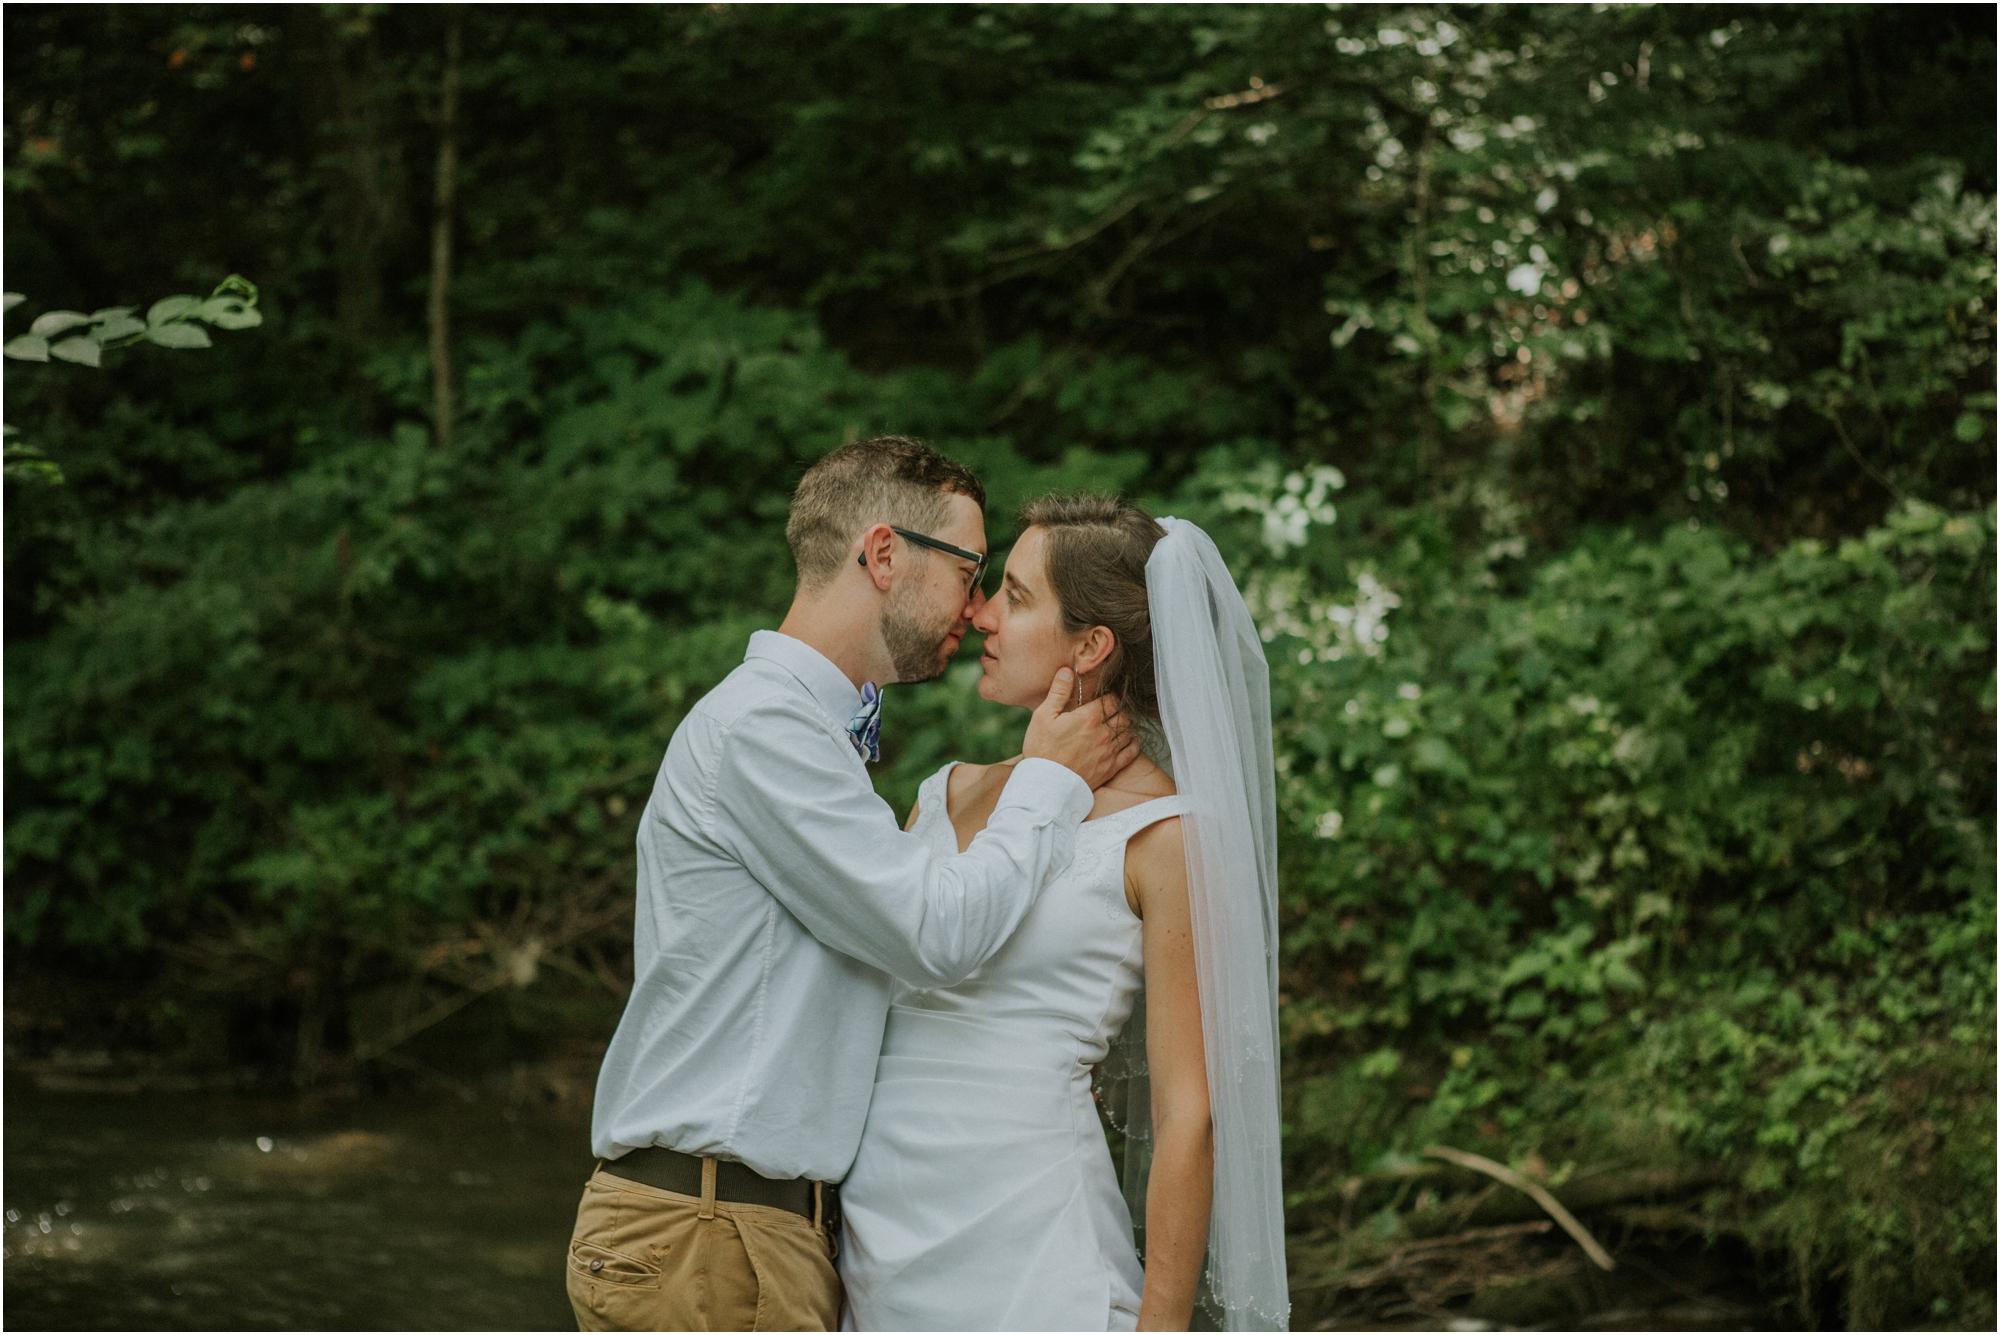 sugar-hollow-park-bristol-virginia-wedding-intimate-woodsy-black-forest-ceremony-adventurous-couple_0089.jpg